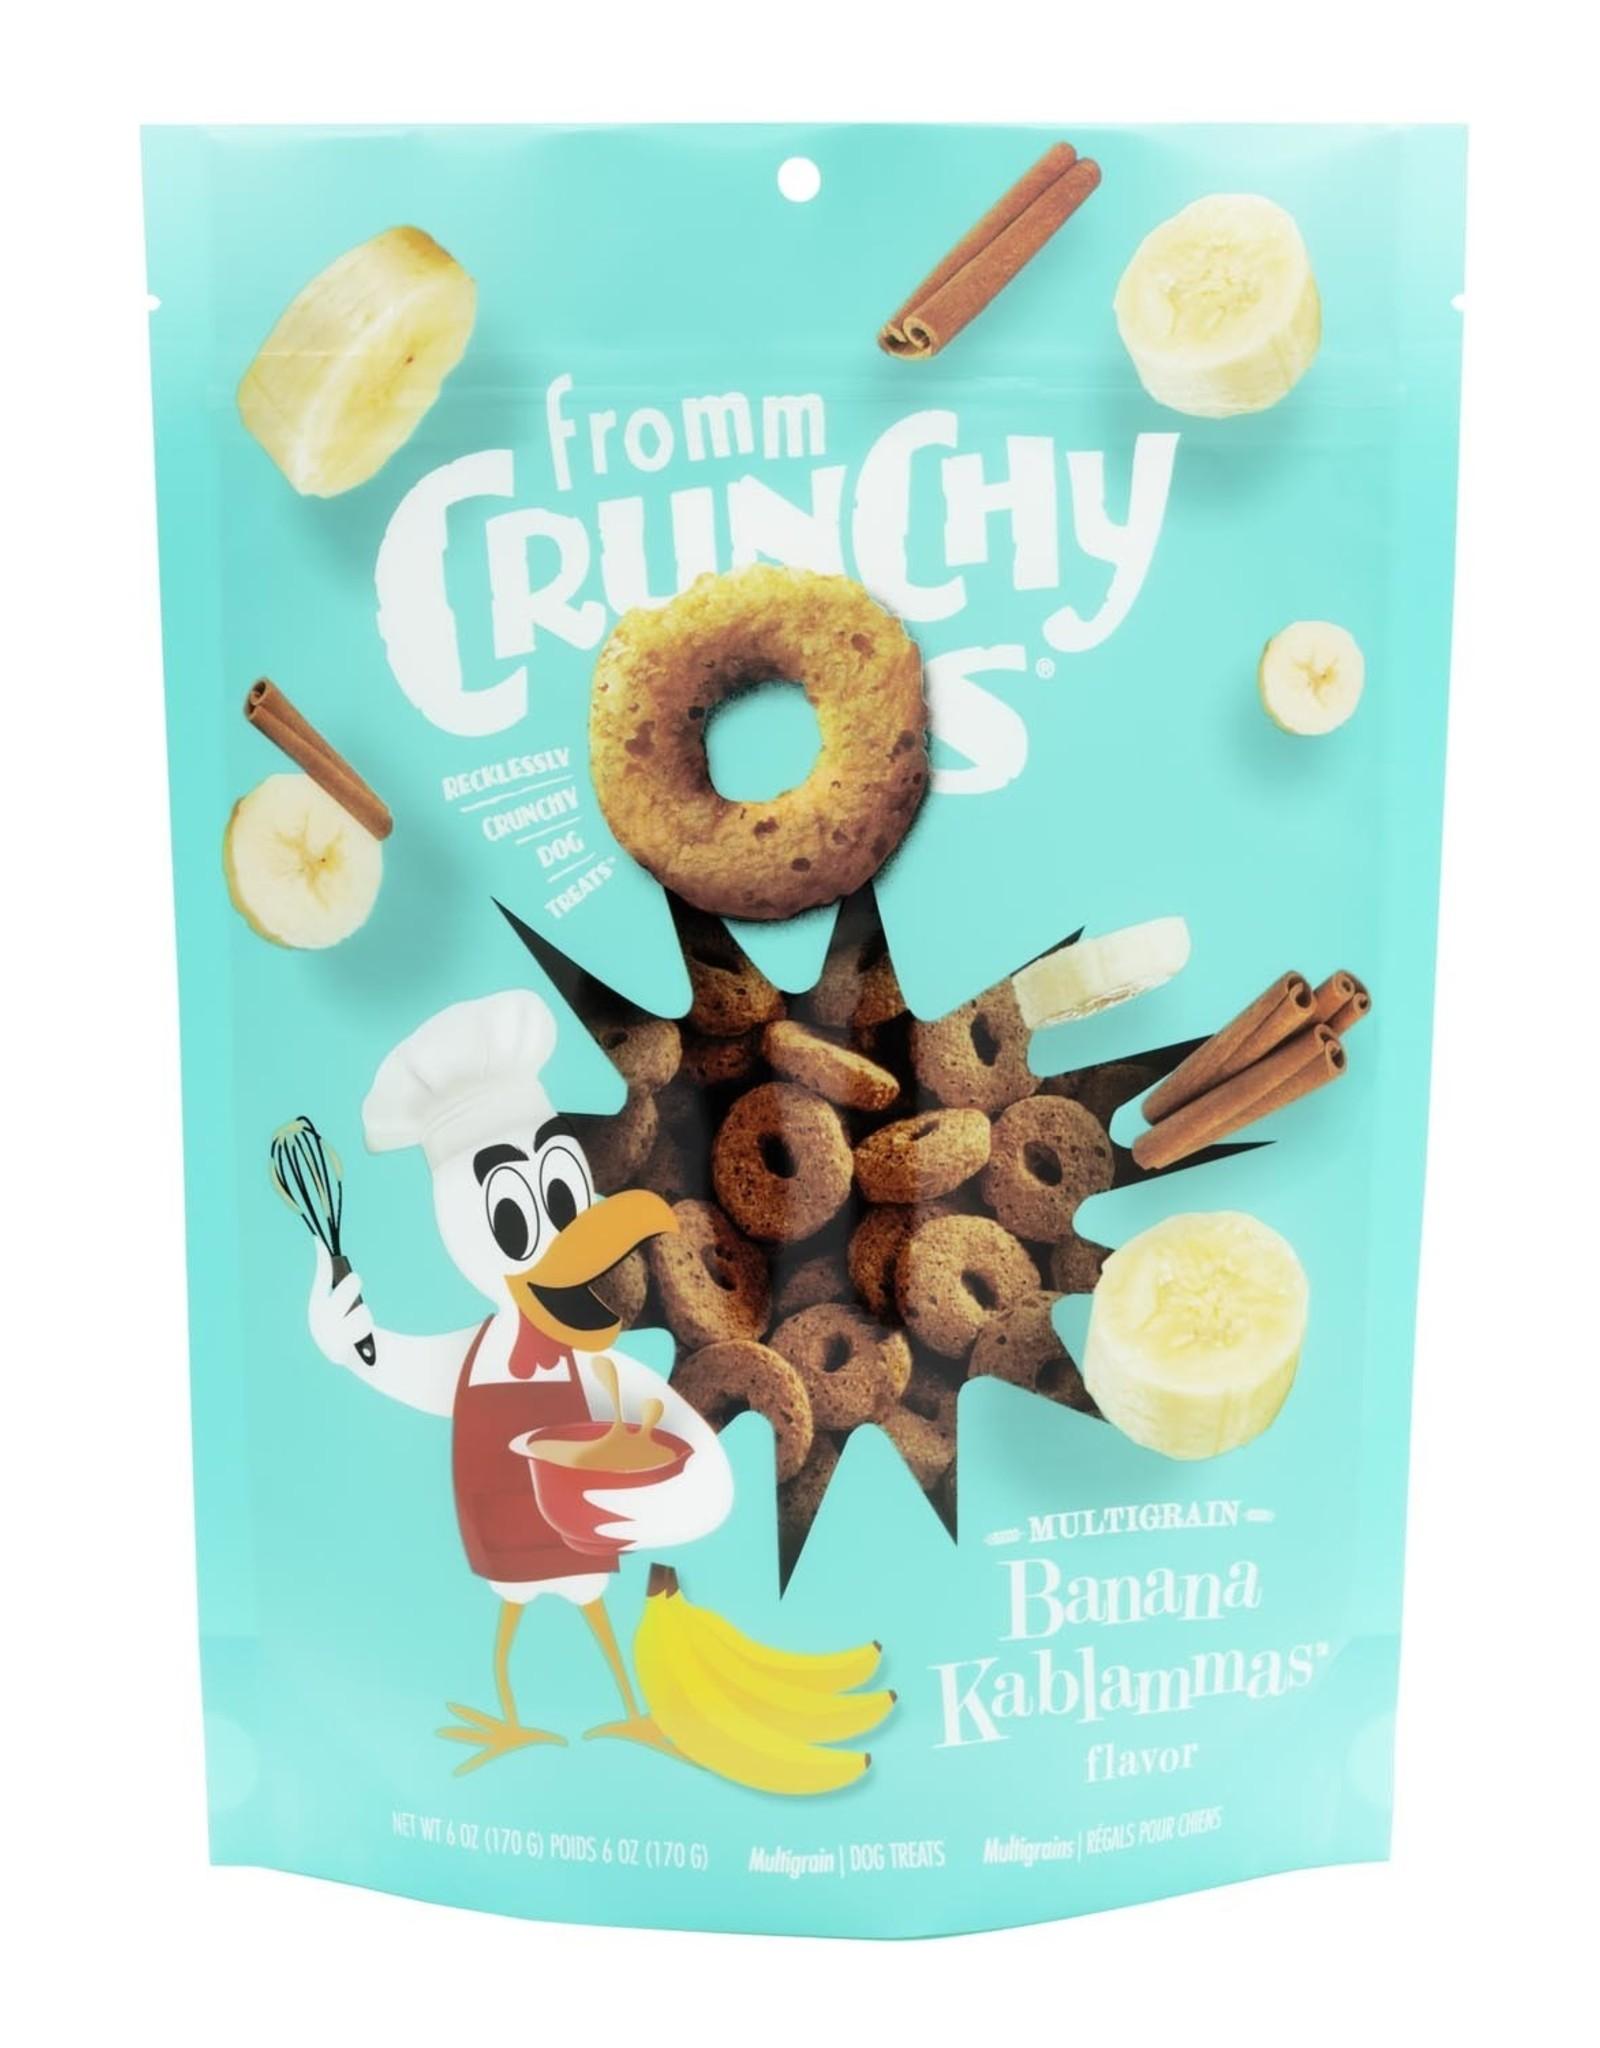 Fromm Fromm Crunchy O's: Banana Kablammas, 6 oz